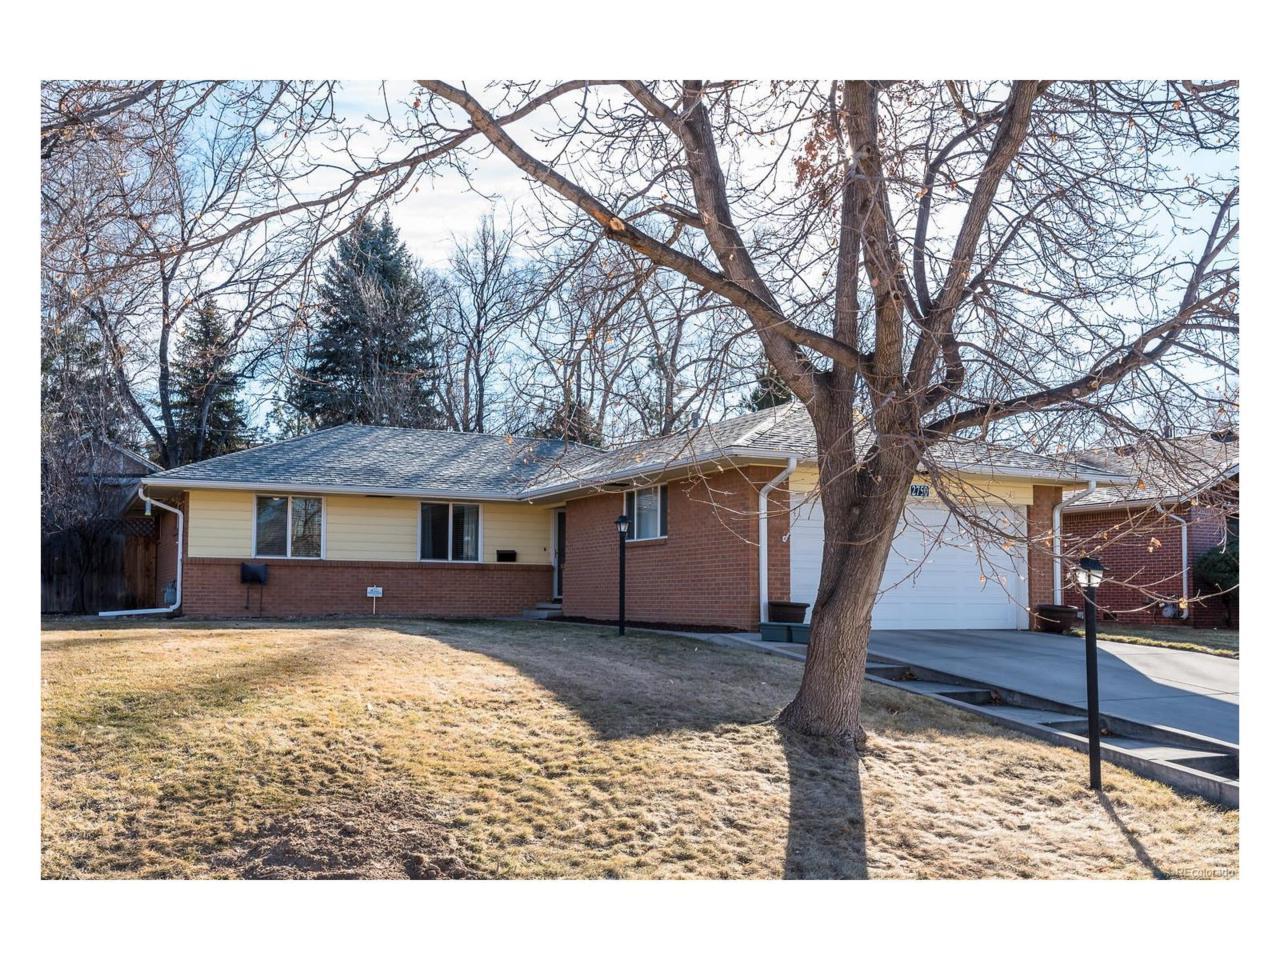 2750 S Washington Street, Englewood, CO 80113 (#6467346) :: Thrive Real Estate Group